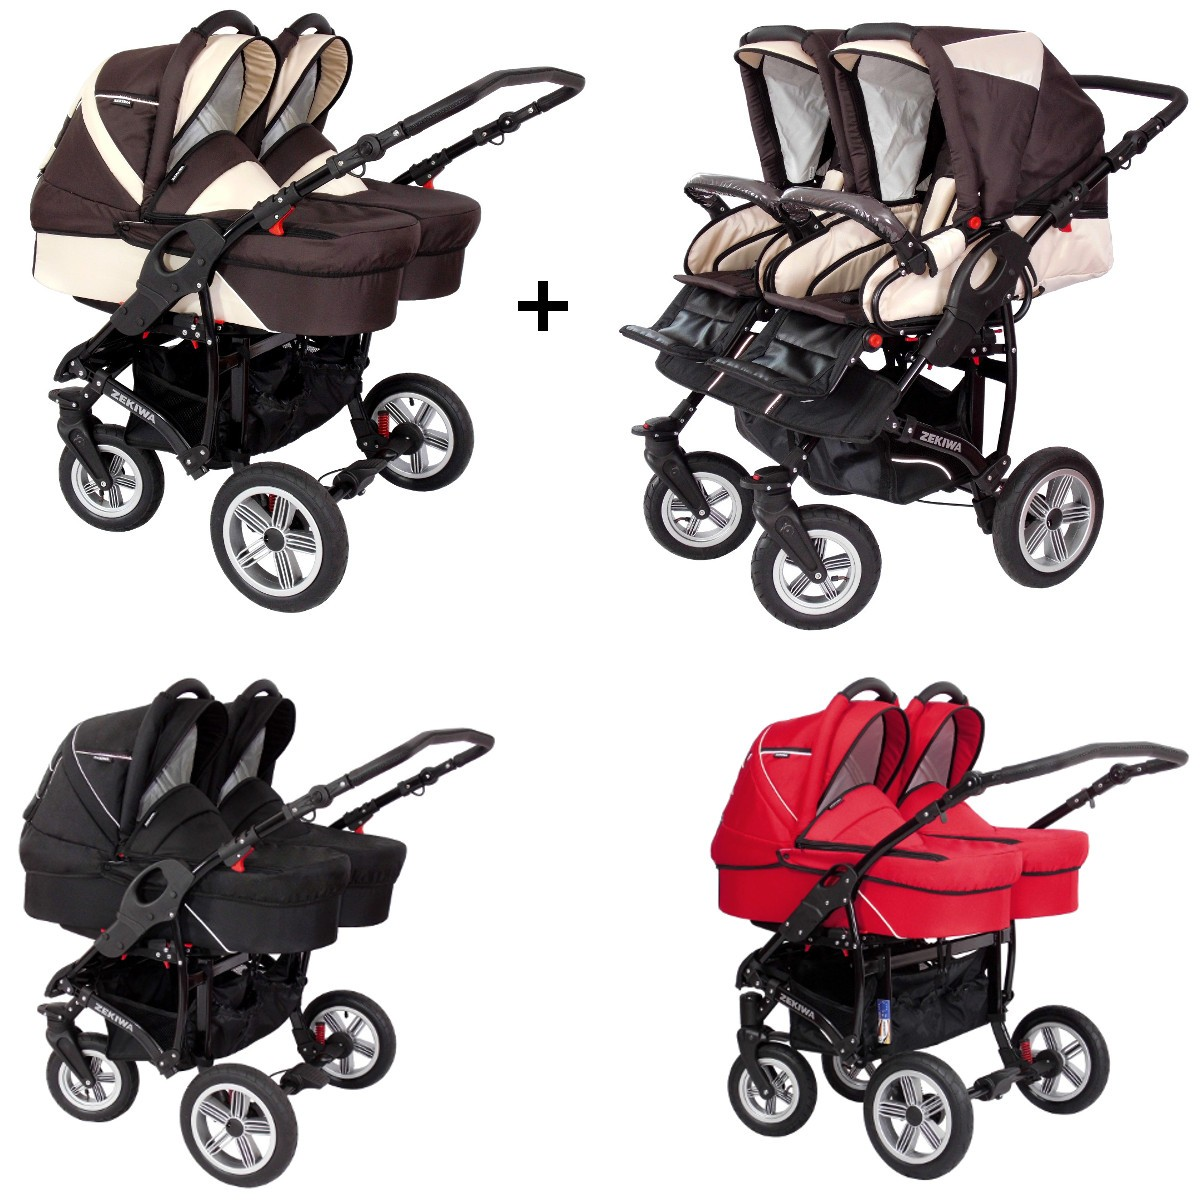 zekiwa sport duo zwillings geschwister kombi kinderwagen set 2in1 mit 2 babywannen 2. Black Bedroom Furniture Sets. Home Design Ideas